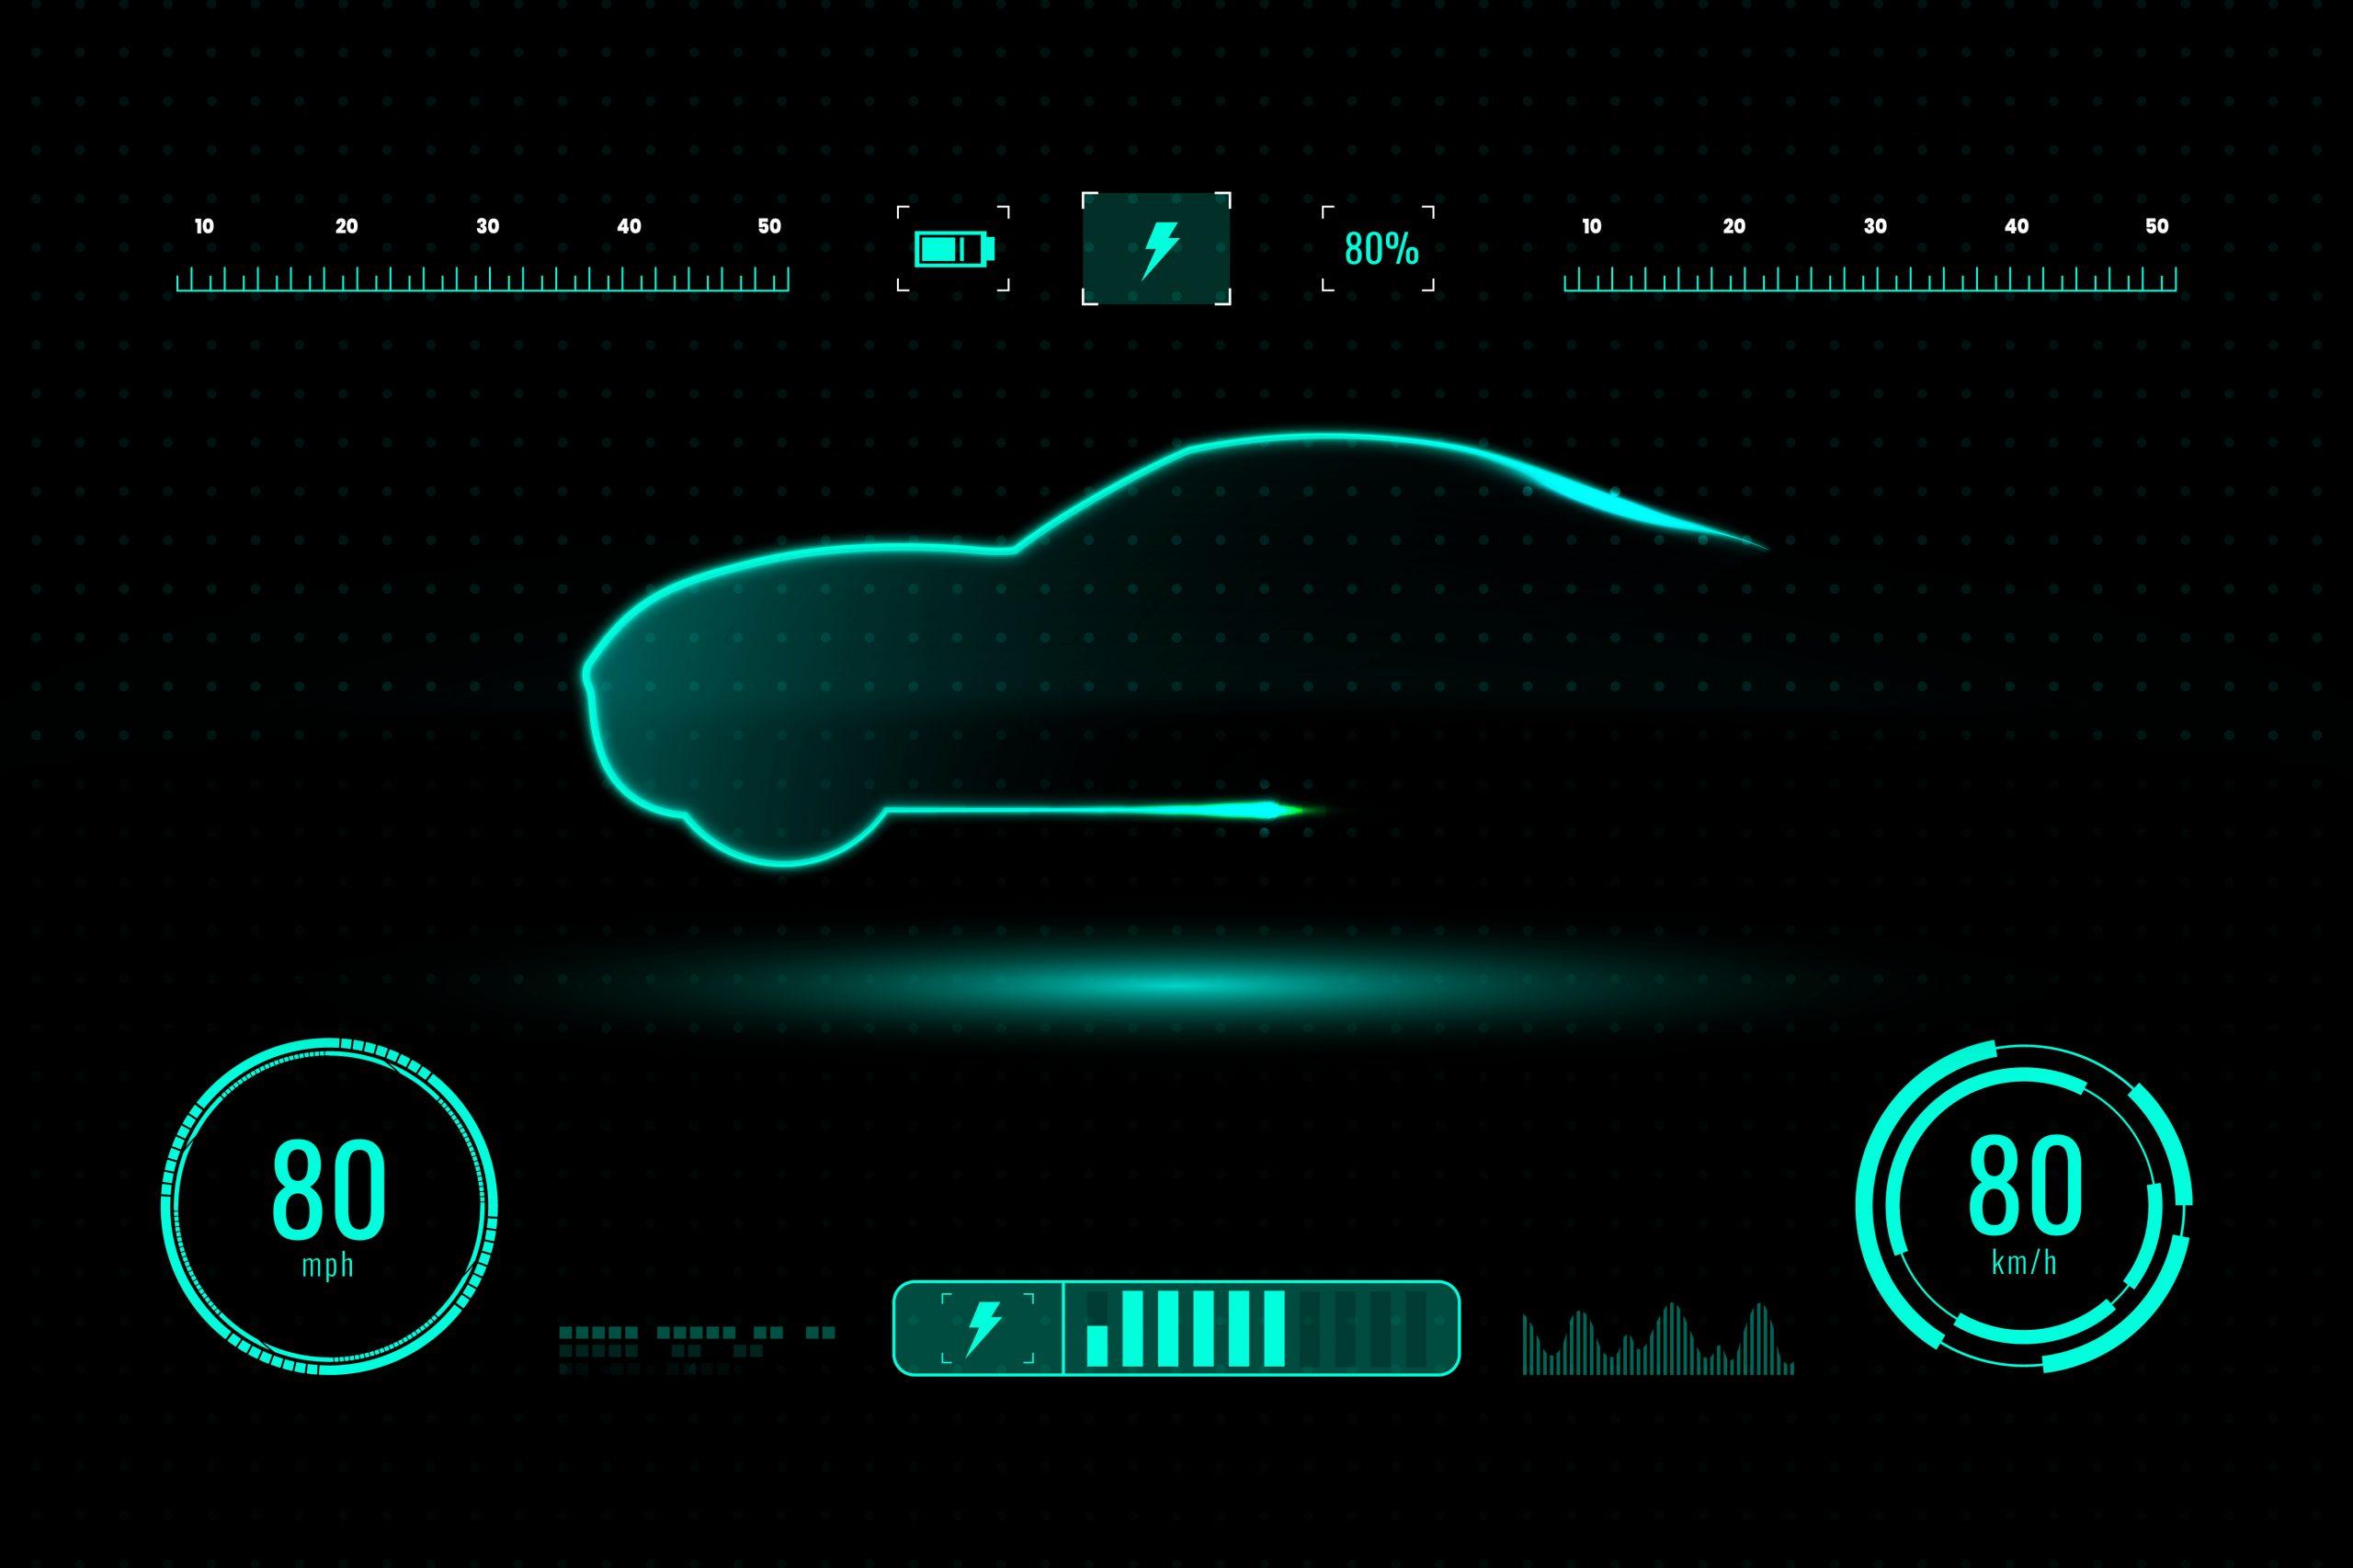 Tecnologia a favor da venda de carros